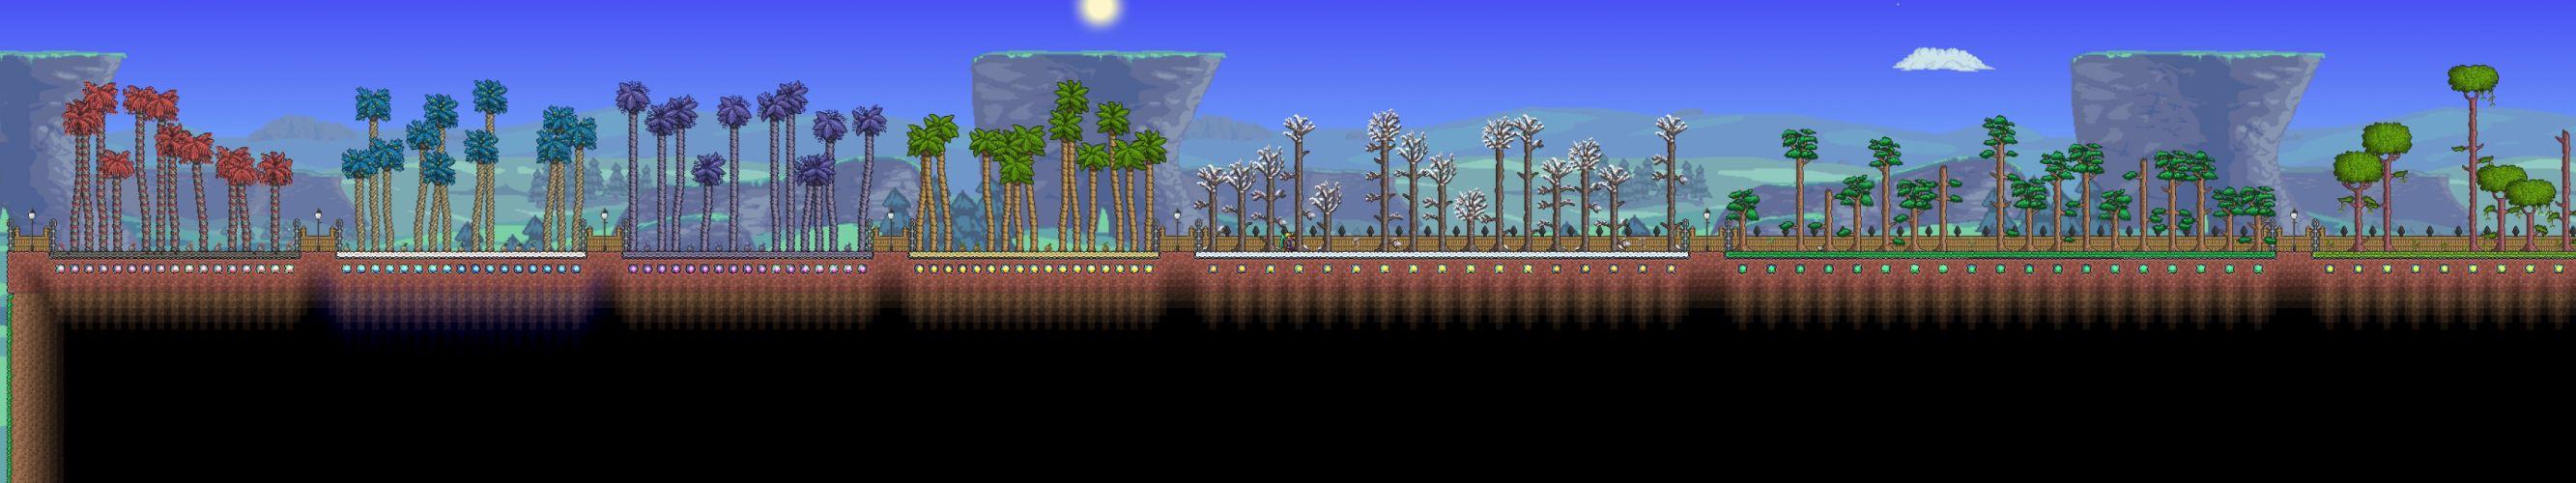 triple monitor multi multiple screen game jeu videogame terraria wallpaper